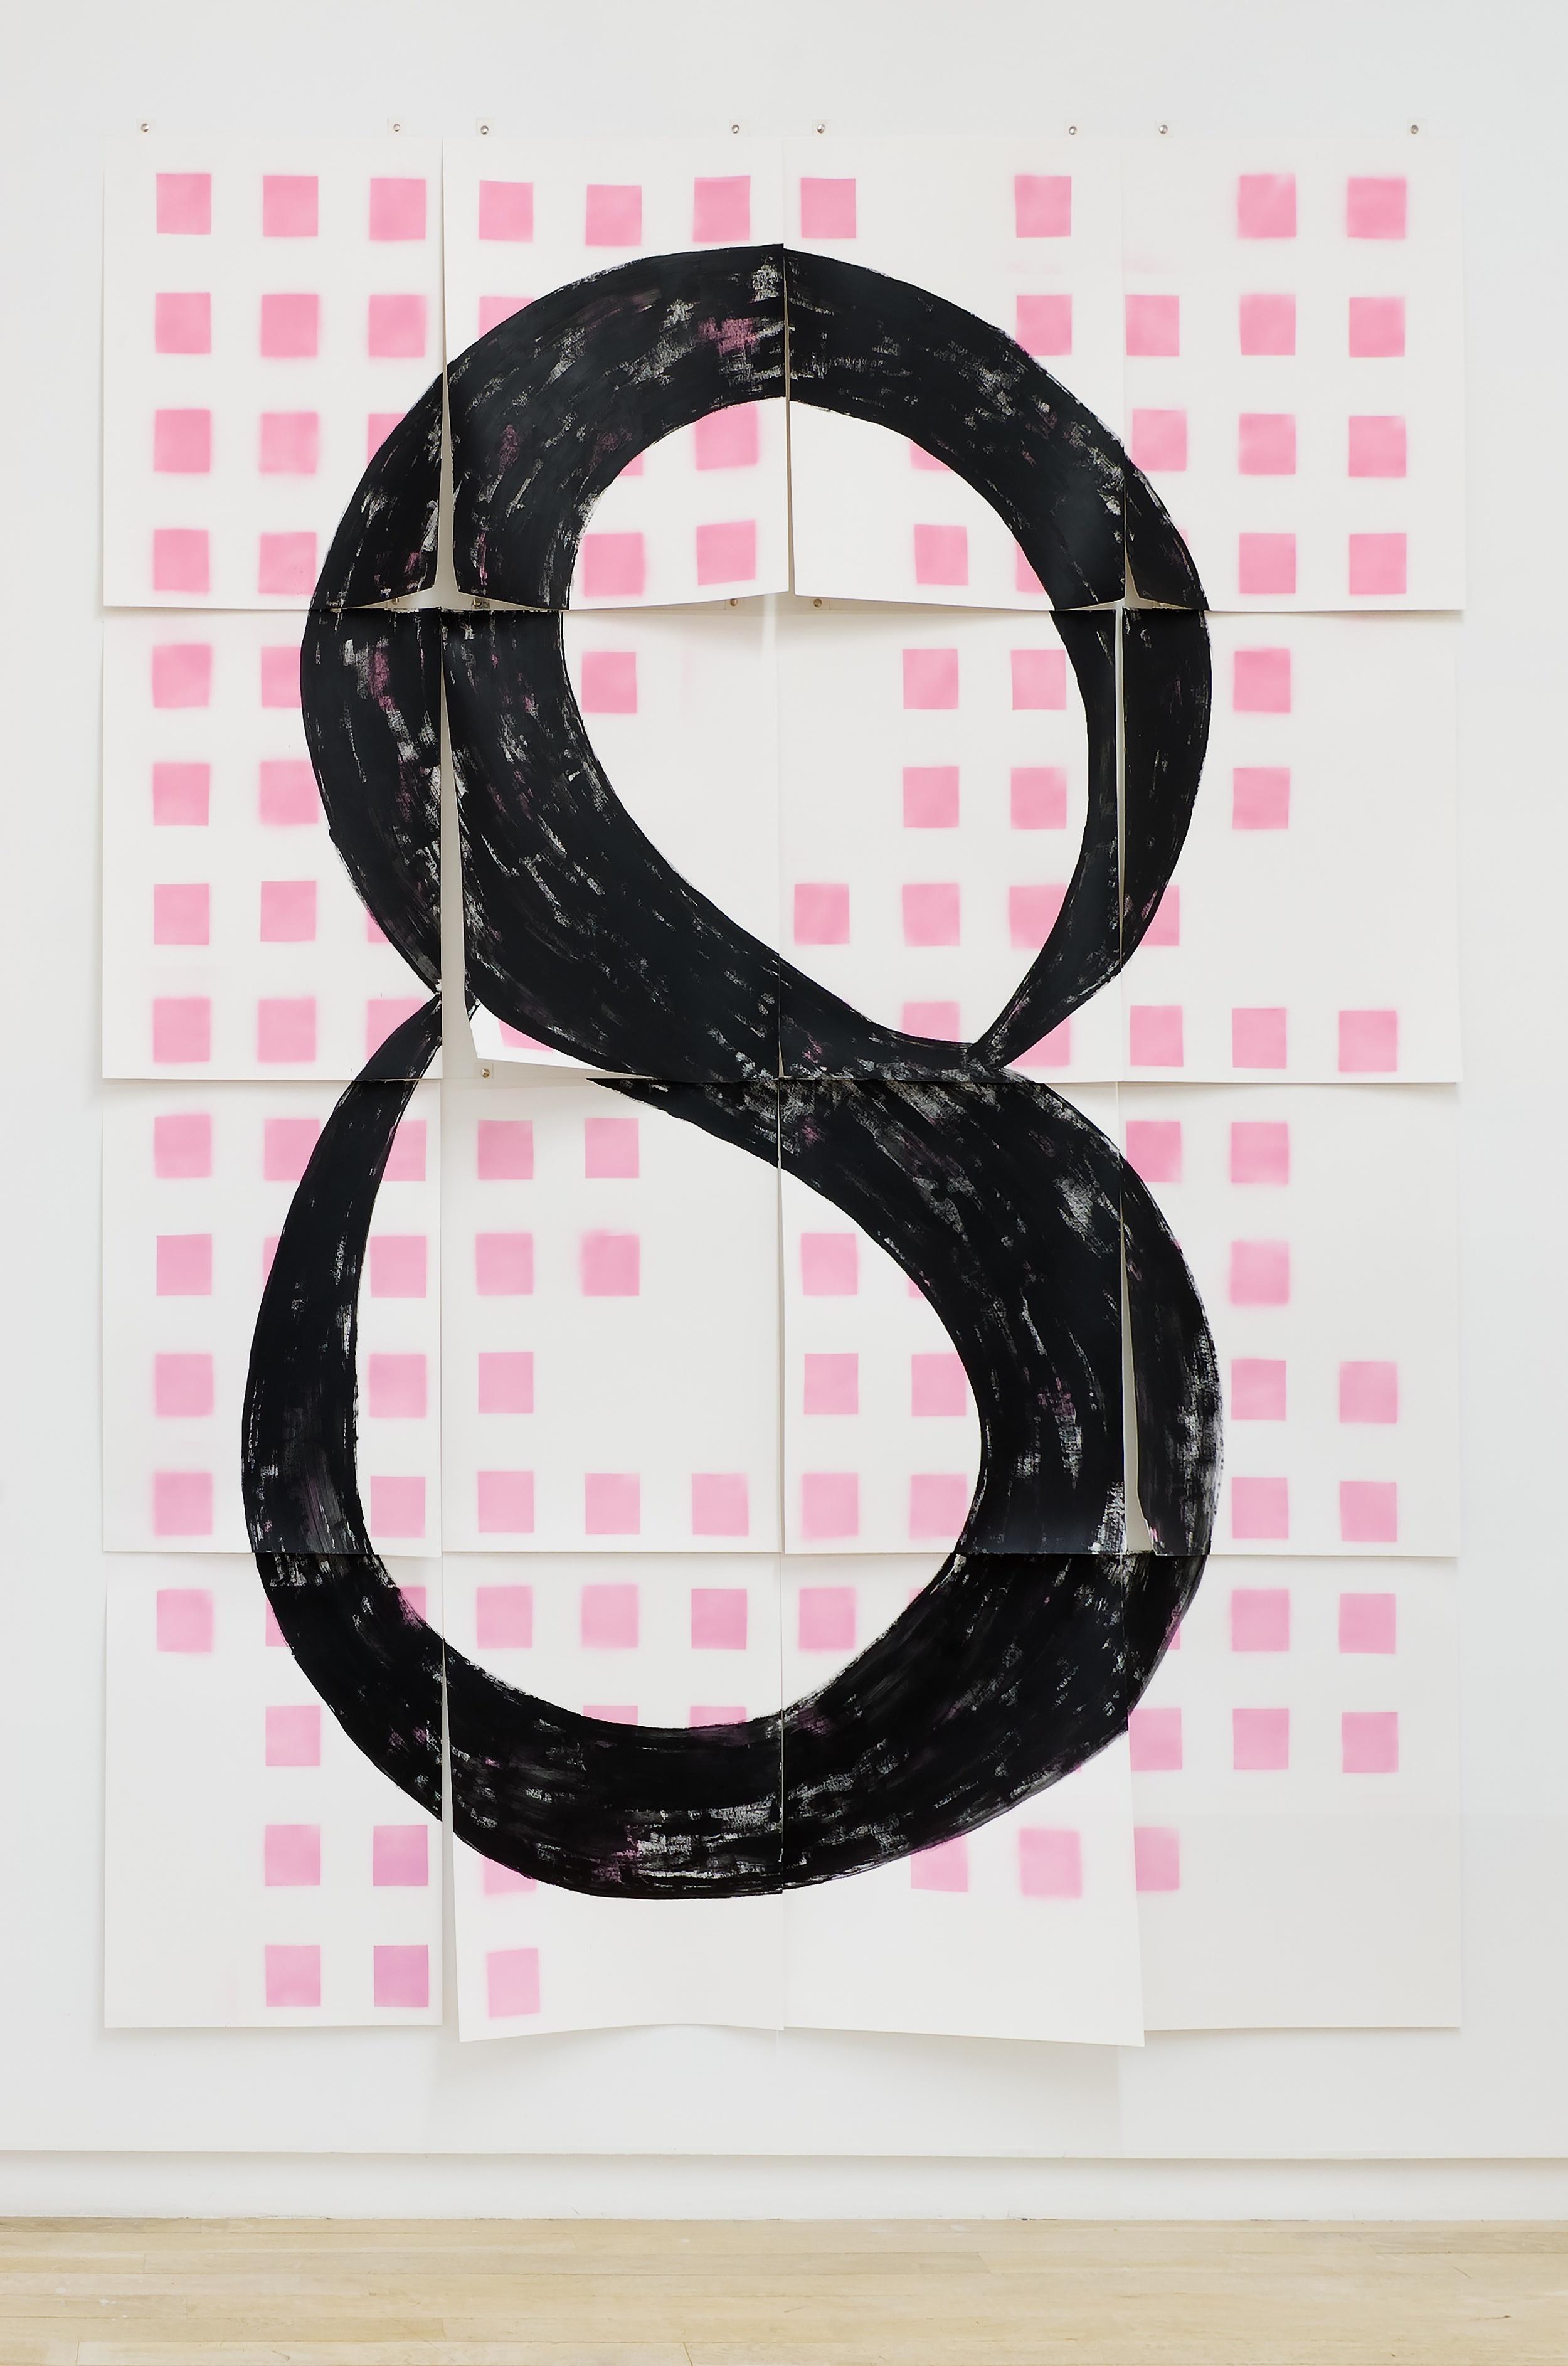 Untitled (8) 2008